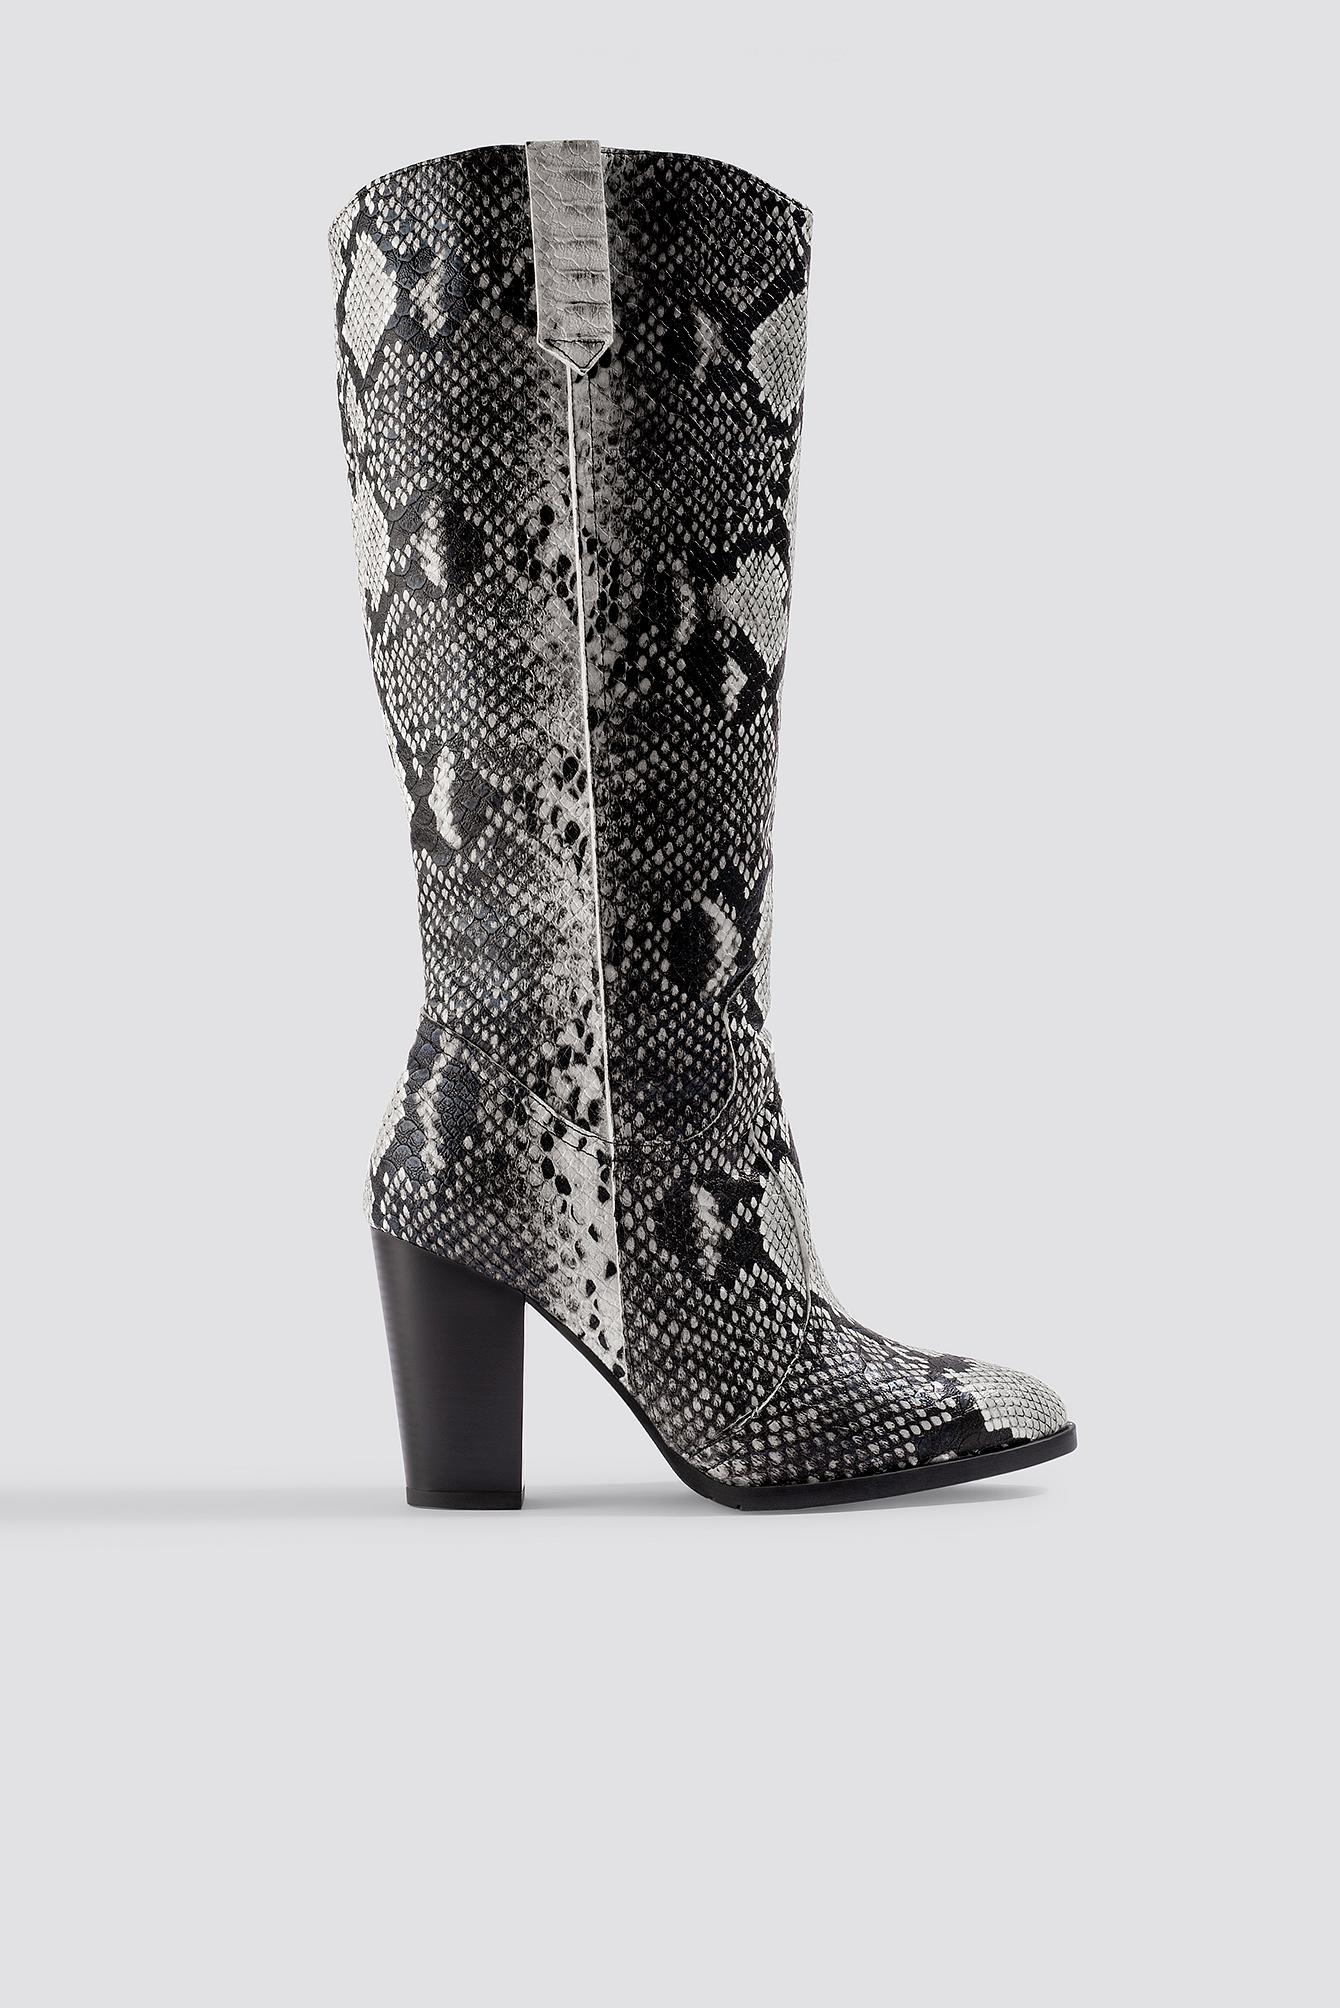 trendyol -  Snake Patterned Boots - Black,White,Multicolor